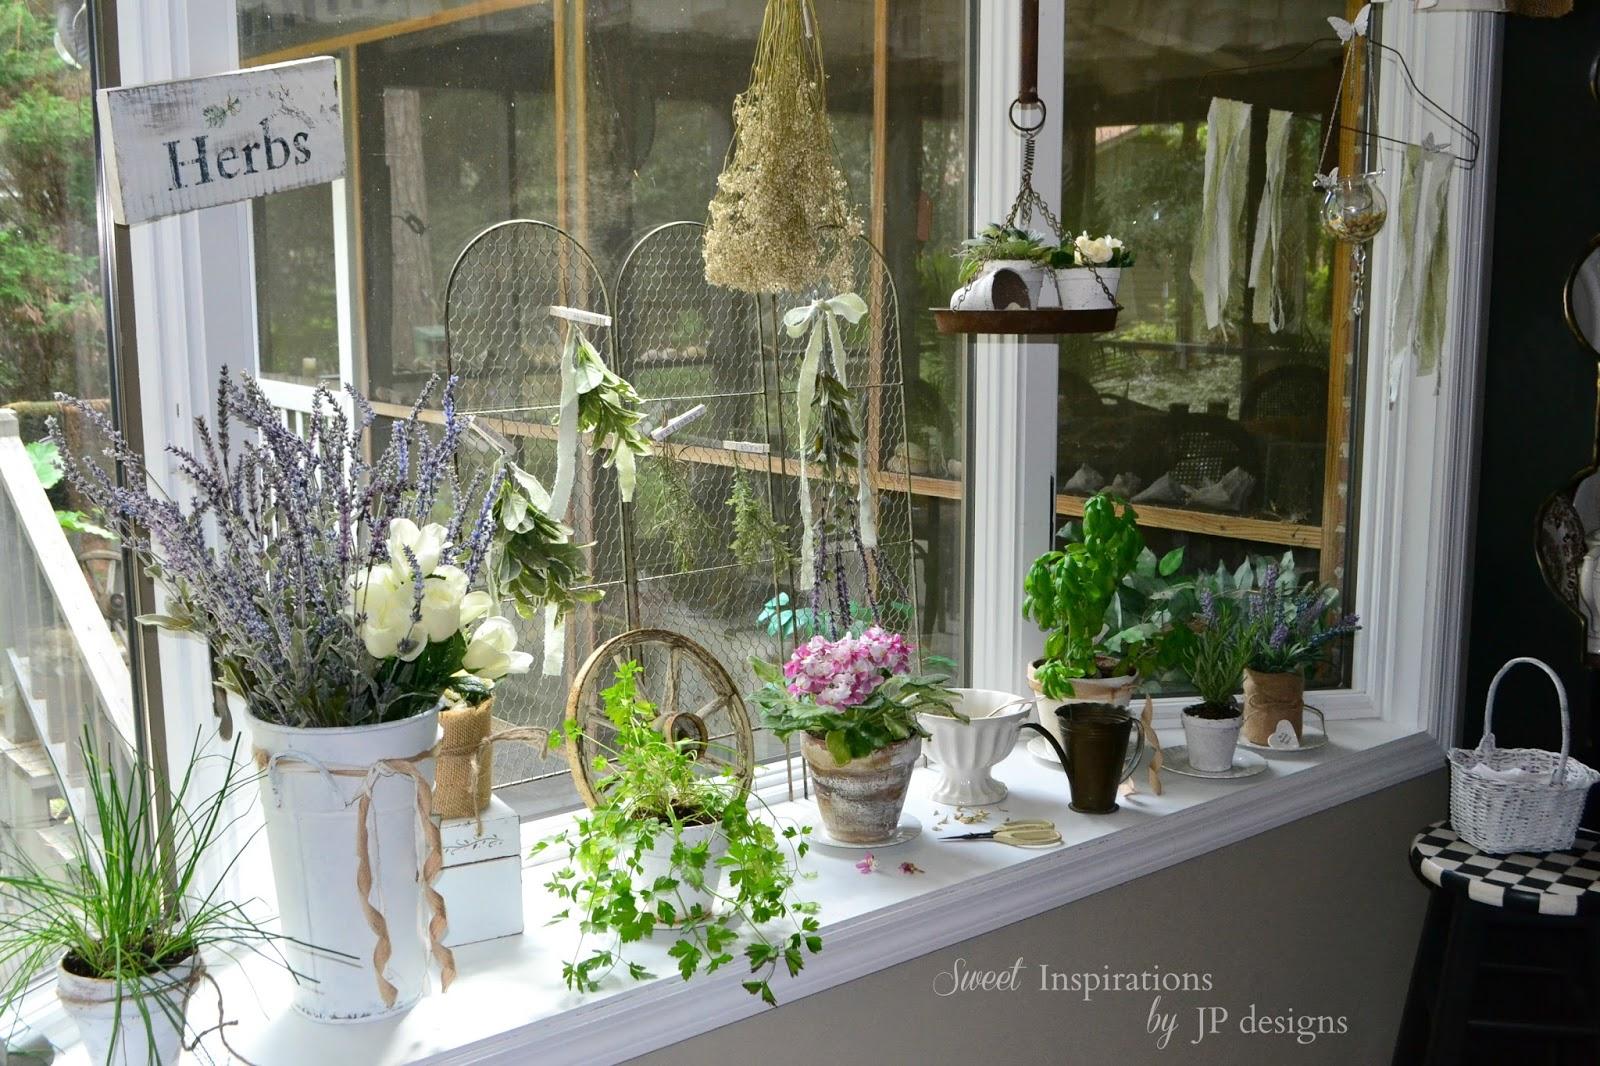 sweet inspirations by jp designs my kitchen window herb garden. Black Bedroom Furniture Sets. Home Design Ideas